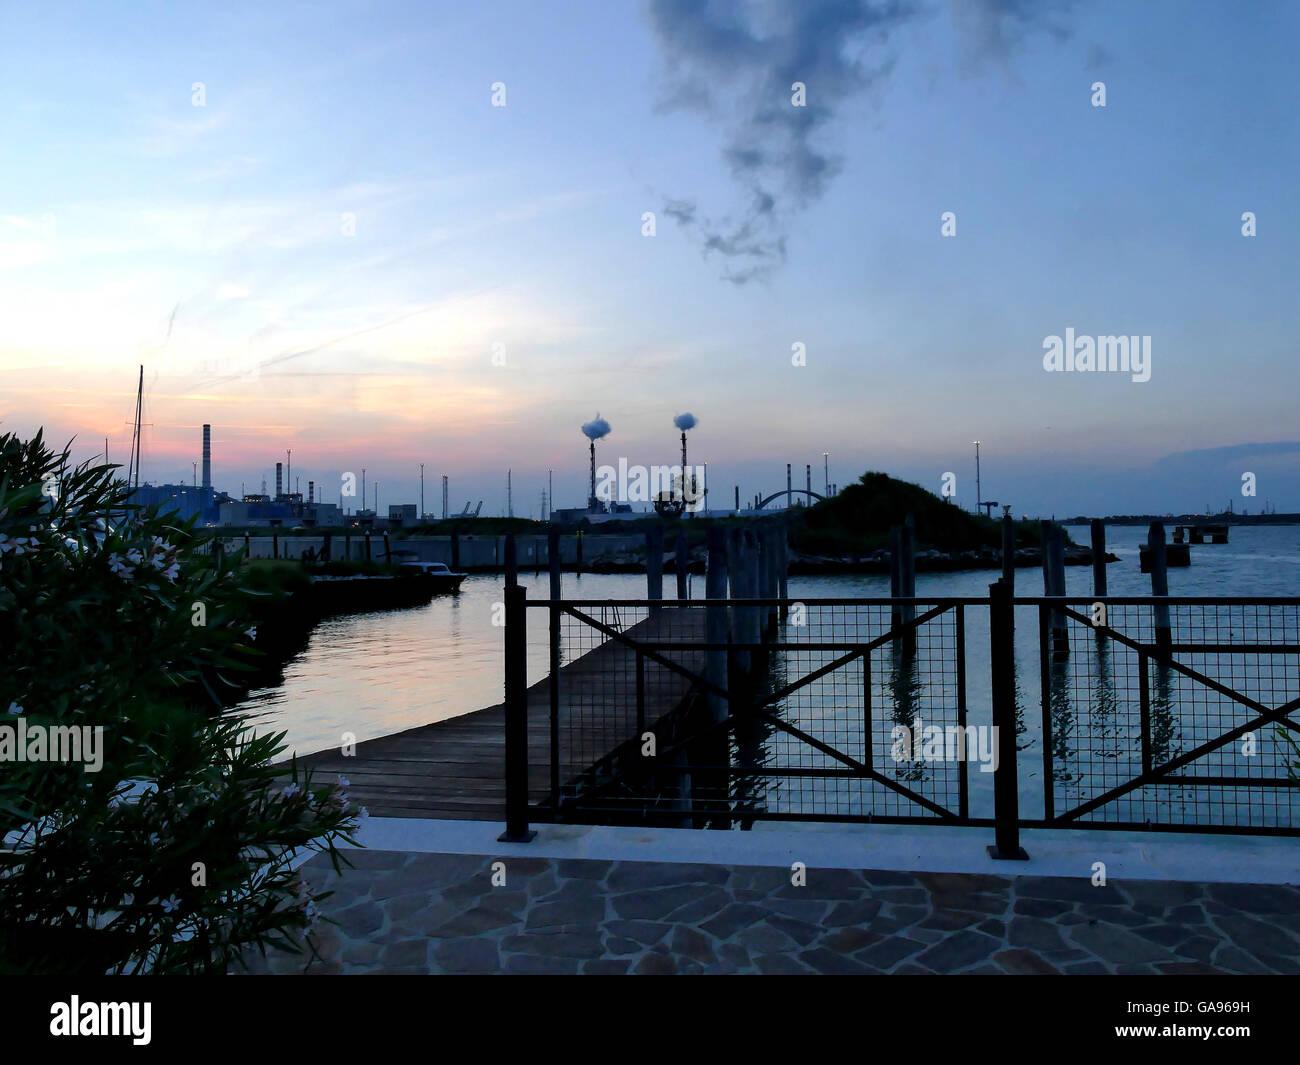 Oil refinery bursting smoke at sunset close to shore, Venice Italy - Stock Image